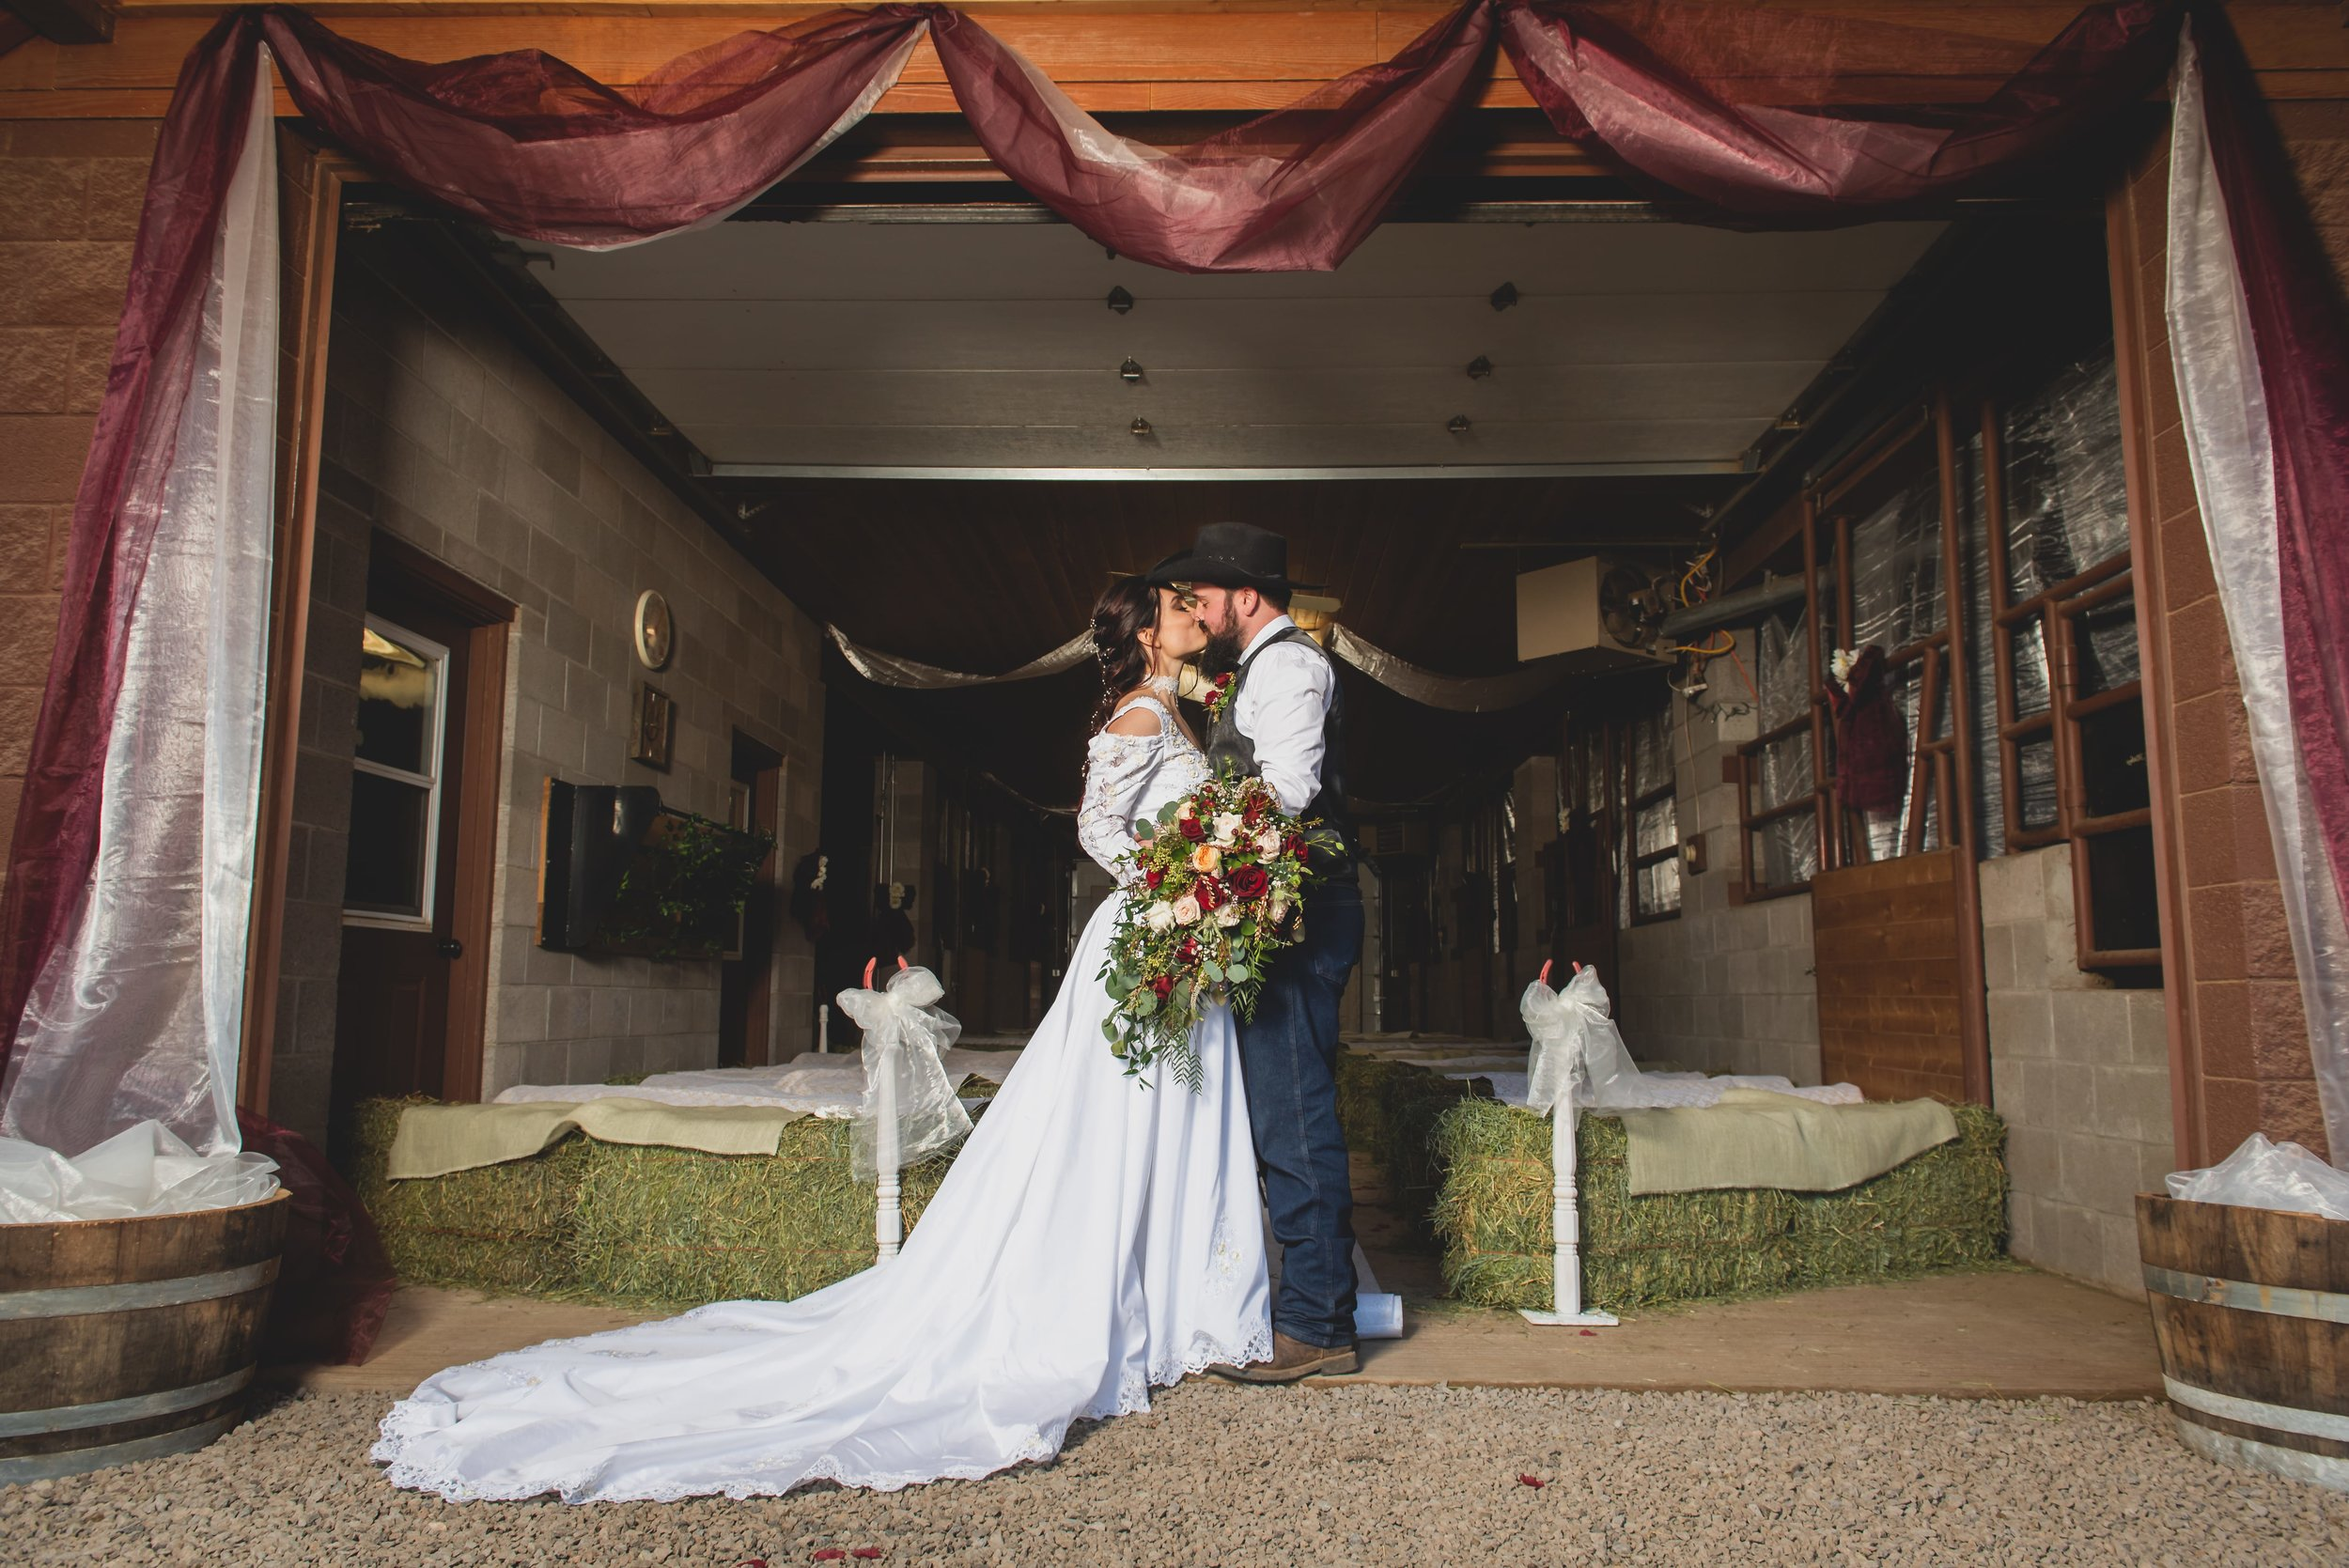 Wedding photography Arizona - Wedding ceremony